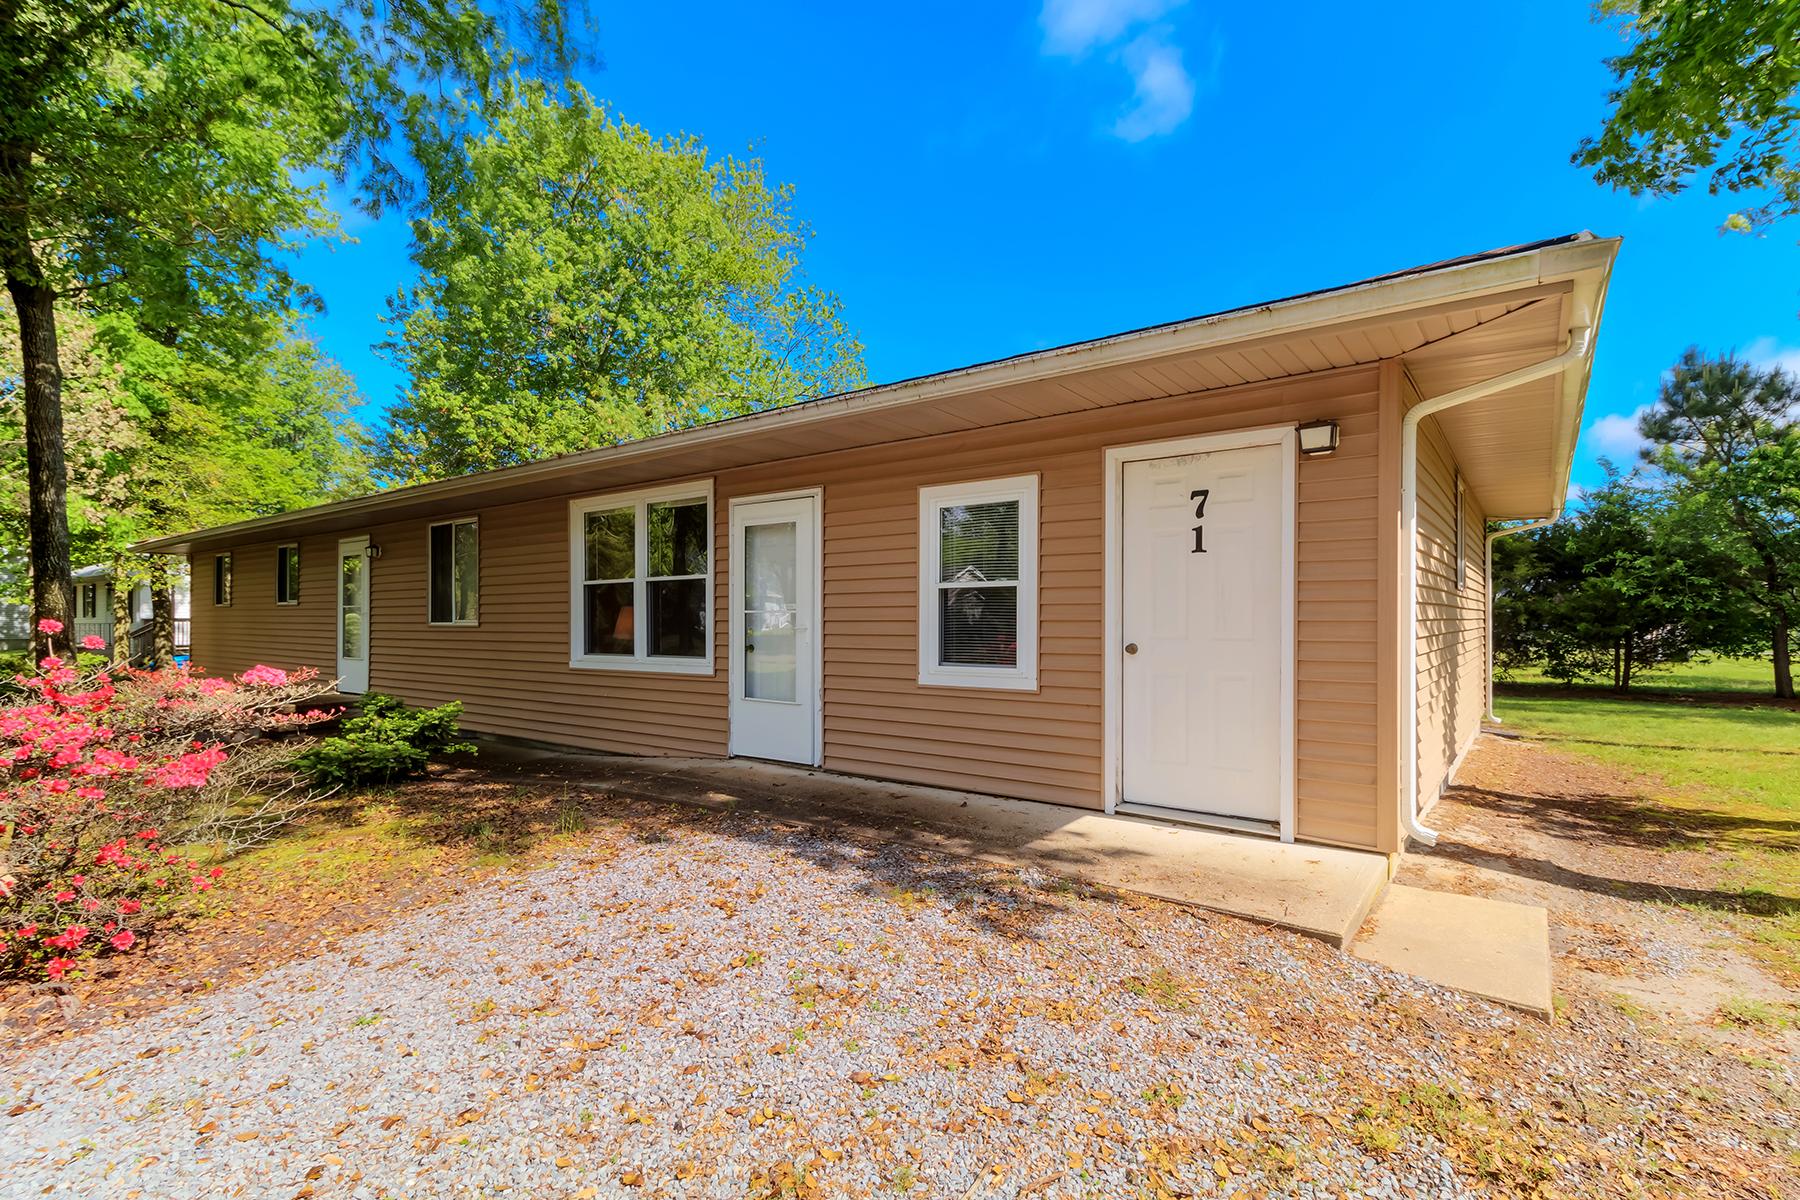 single family homes 为 销售 在 71 Dorothy Cir , Ocean View, DE 19970 71 Dorothy Cir 奥切安, 特拉华州 19970 美国